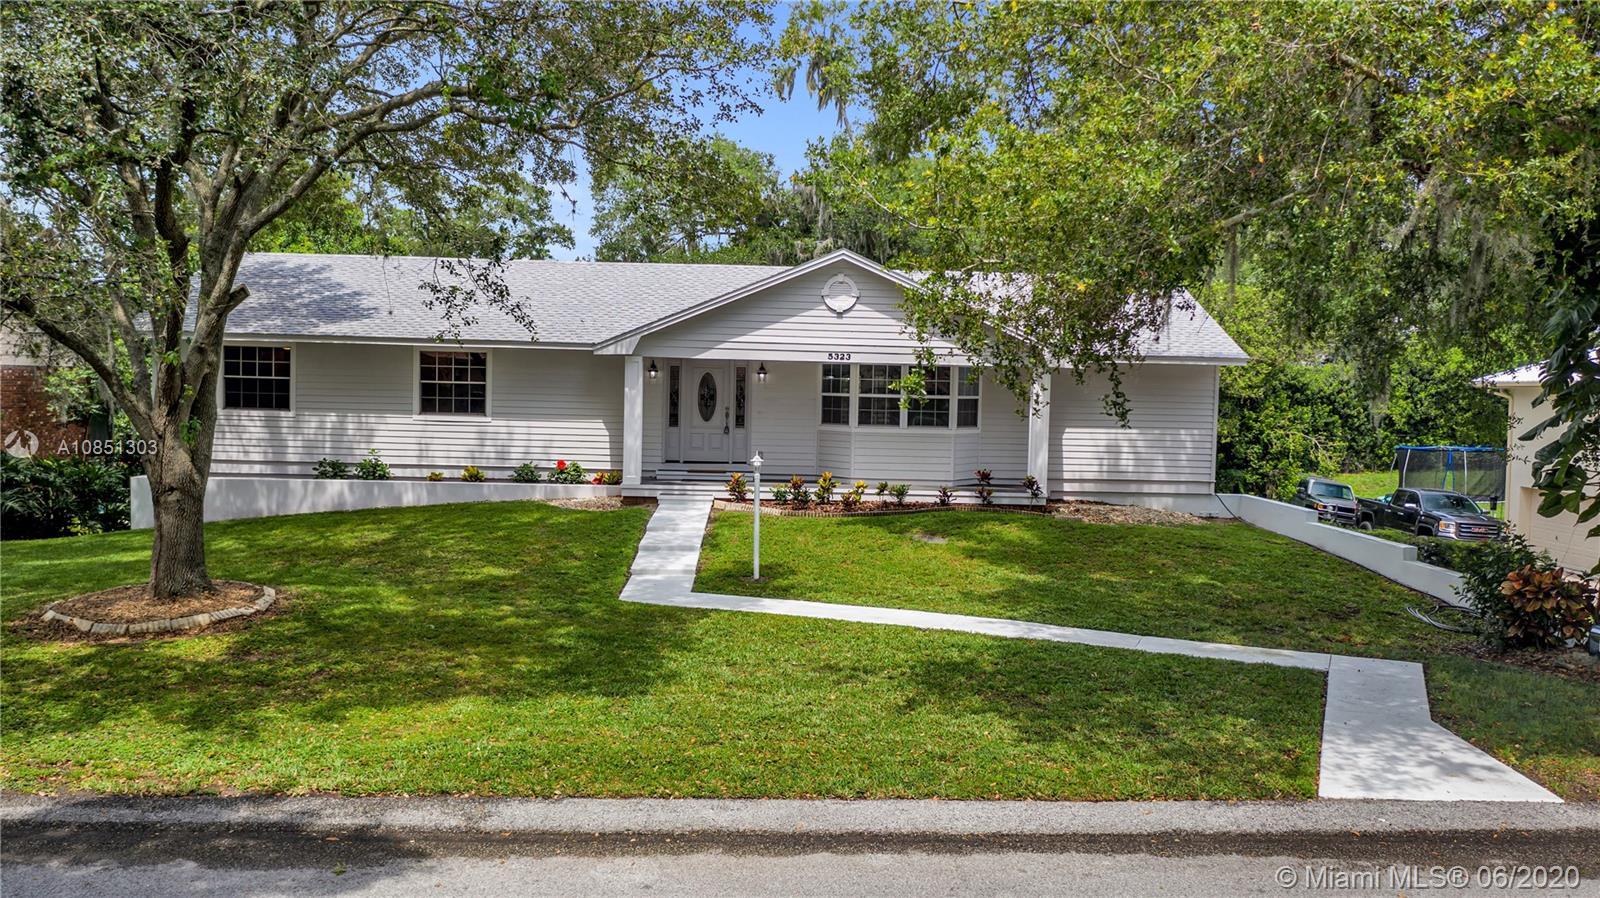 5323 Ray Place, Lakeland, FL 33813